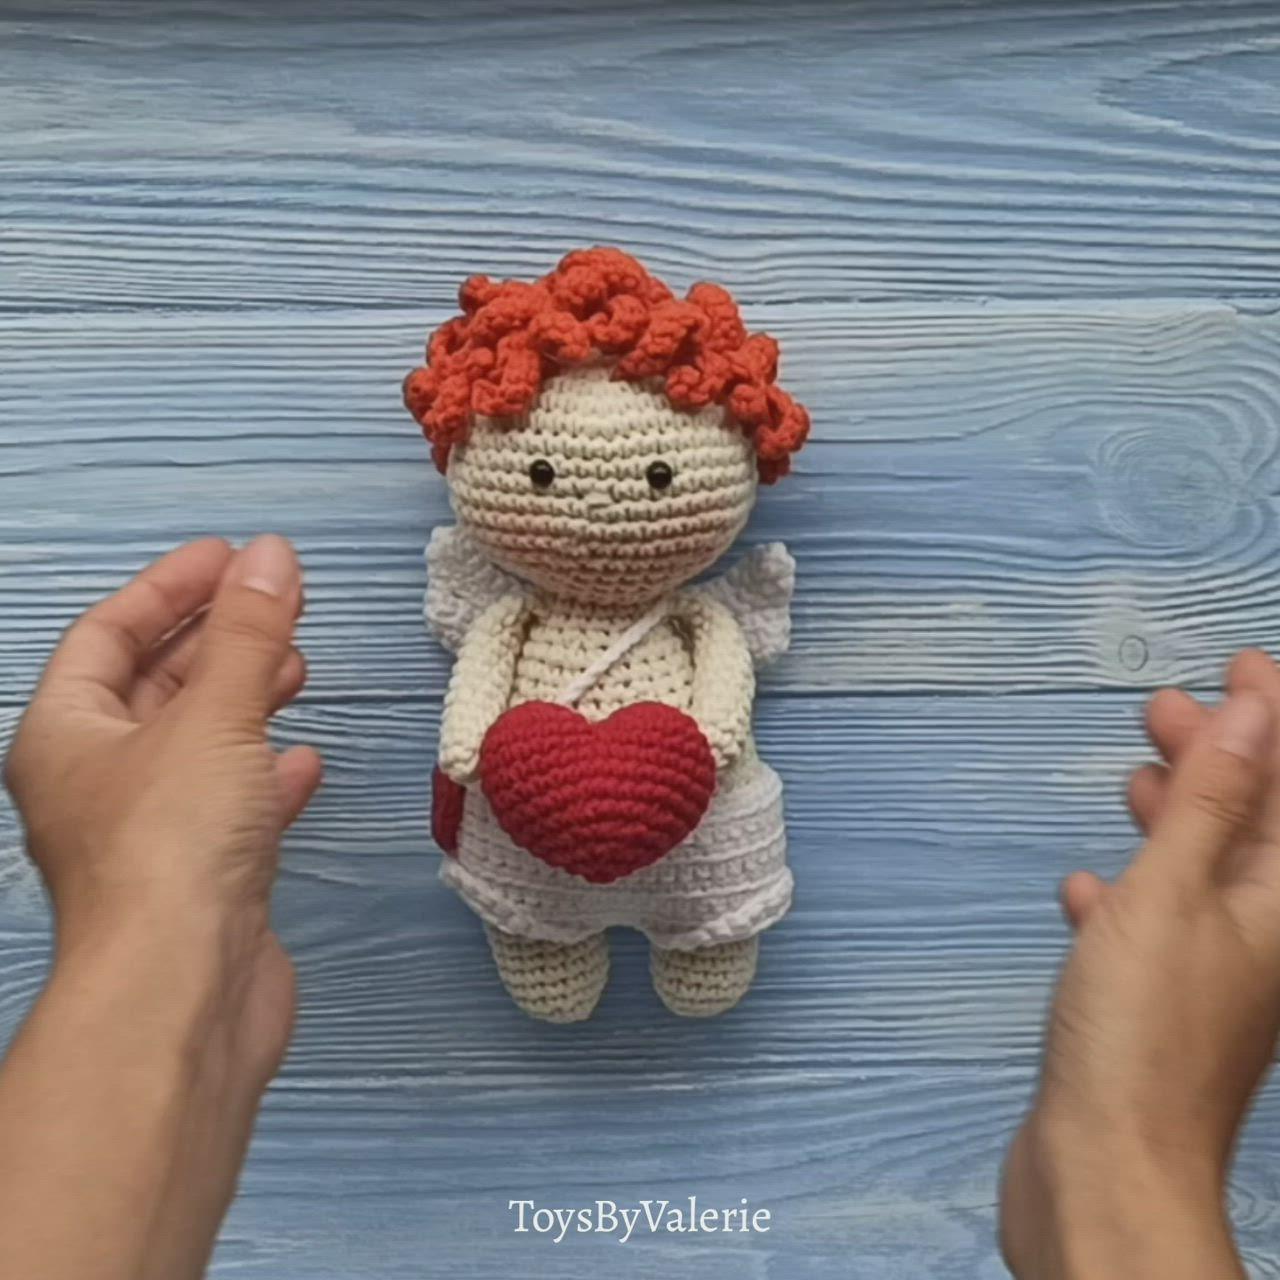 Pattern Love Angel Amigurumi Crochet Pattern Handmade Gift For Etsy Video Video In 2020 Crochet Amigurumi Knitting Patterns Toys Crochet Toys Patterns